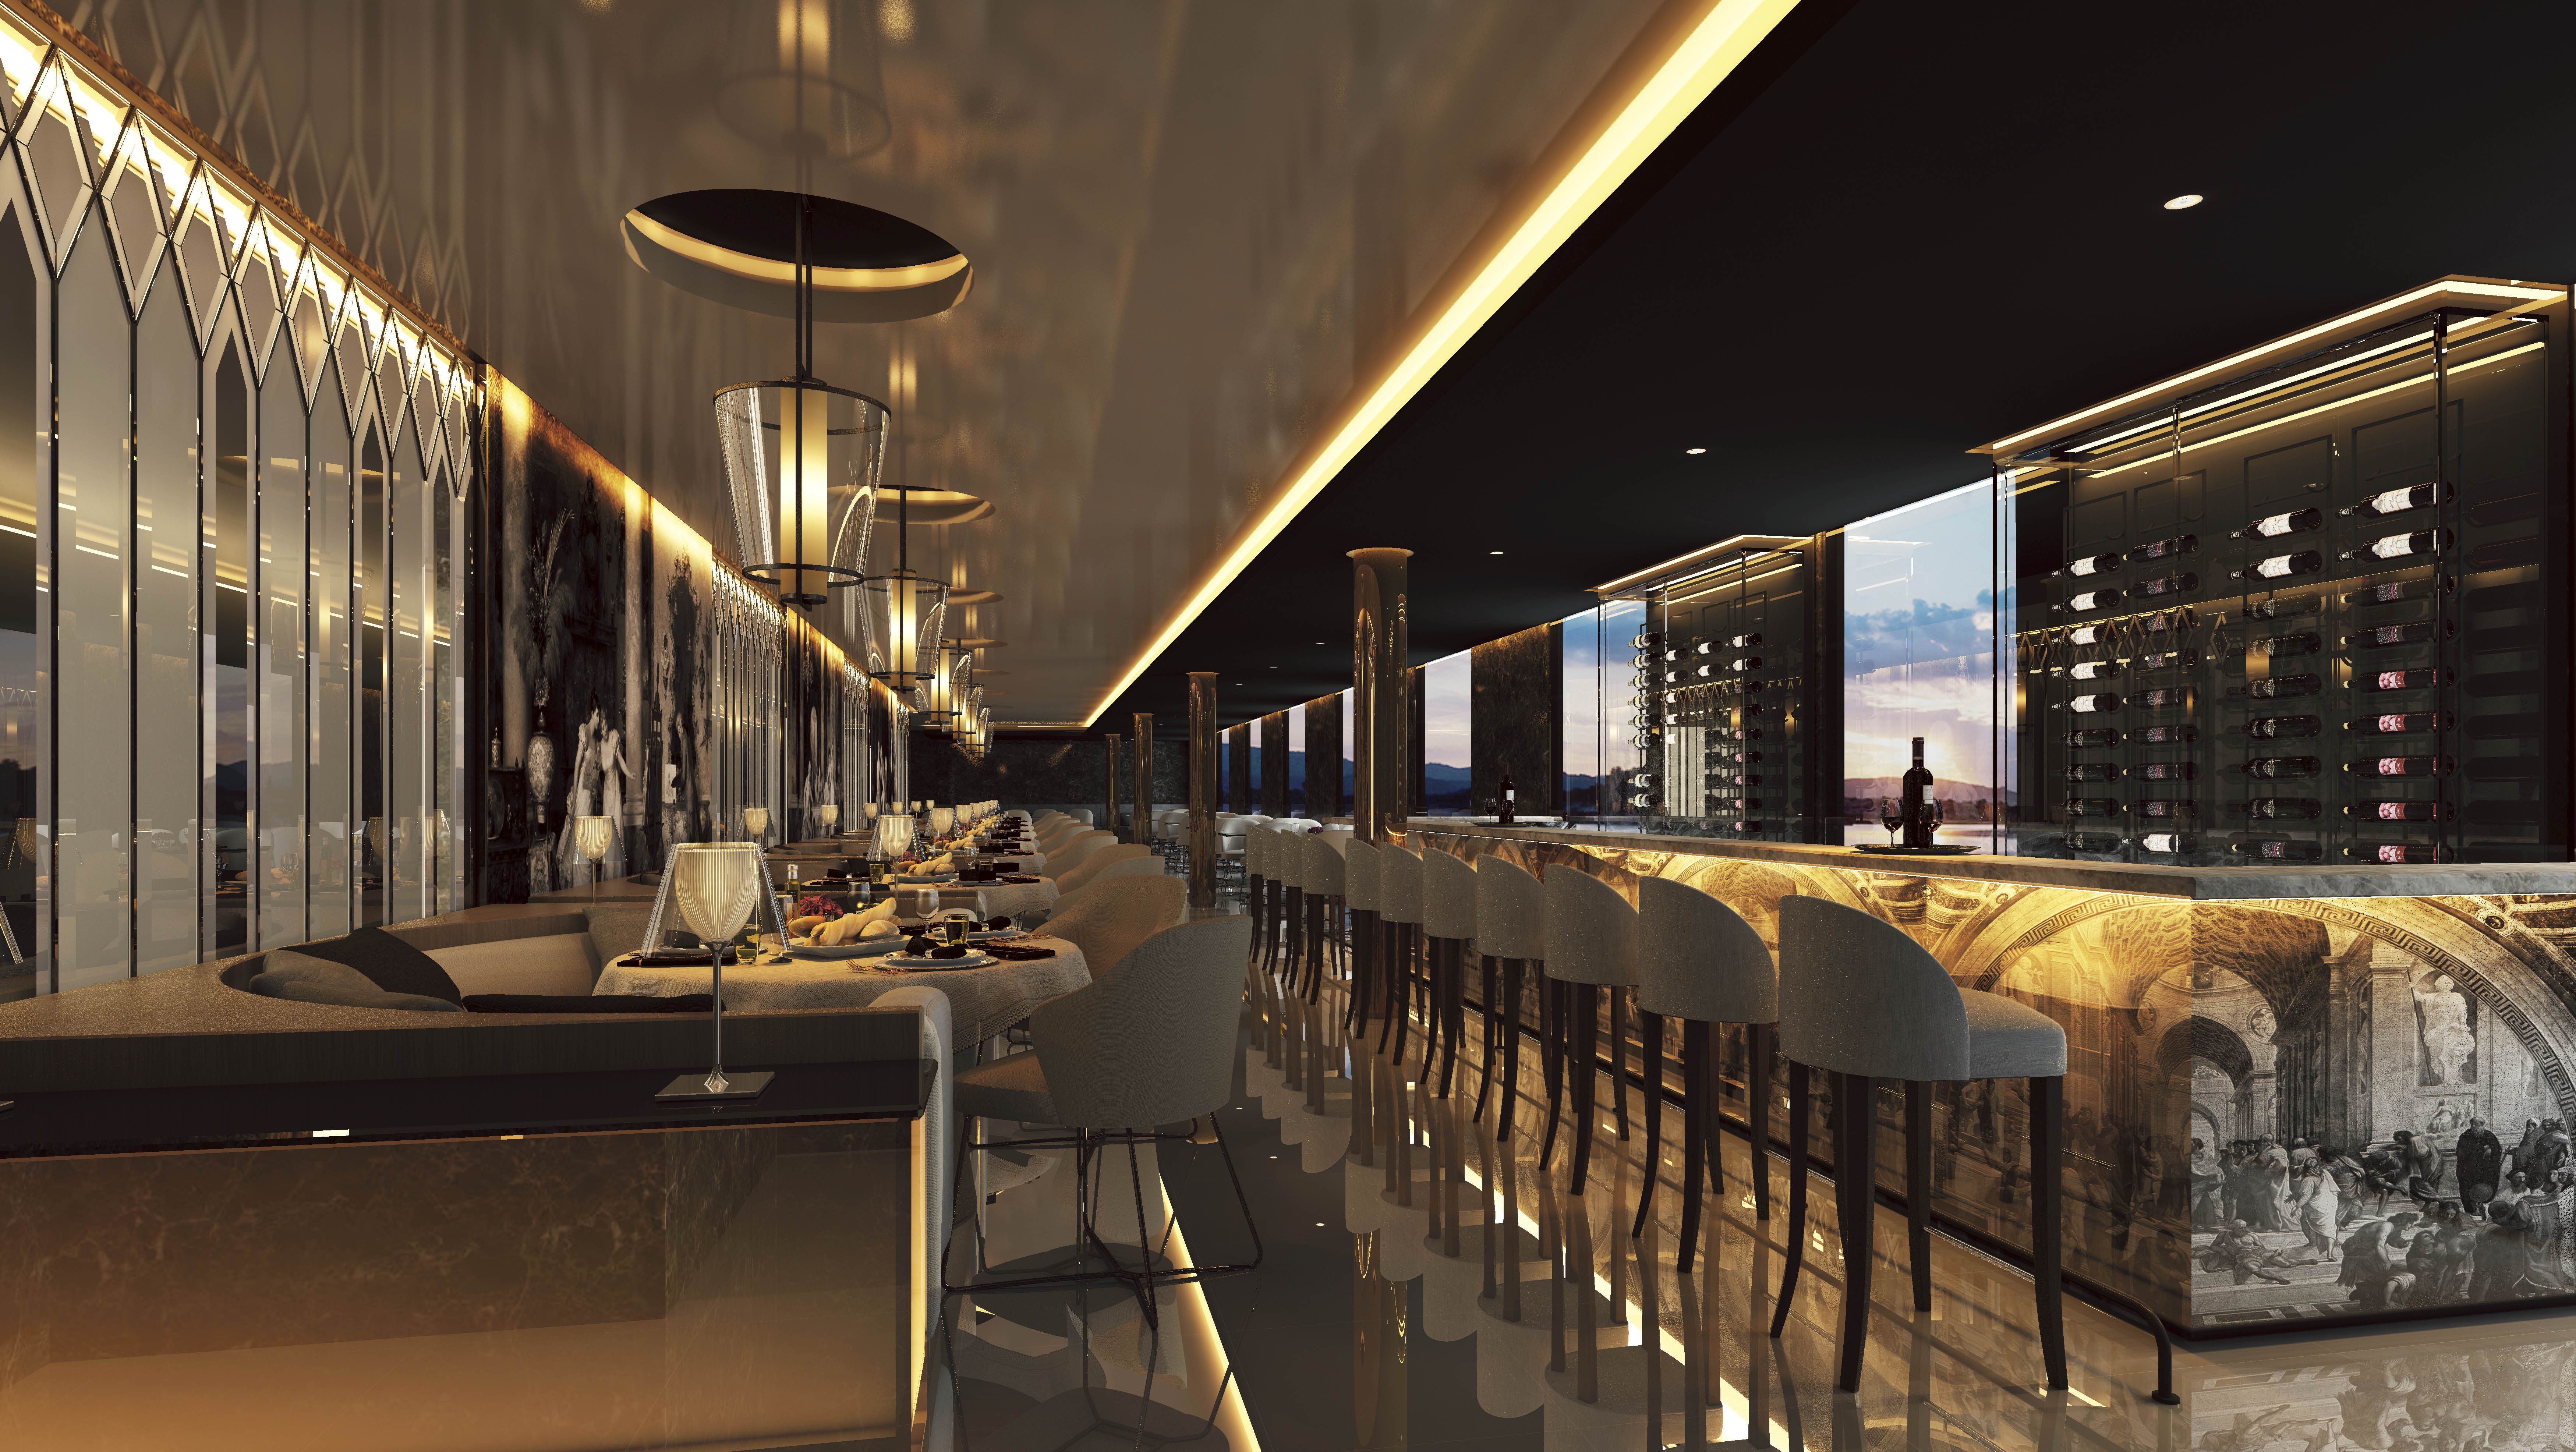 Scenic Eclipse - Steakhouse & Italienisches Spezialitätenrestaurant